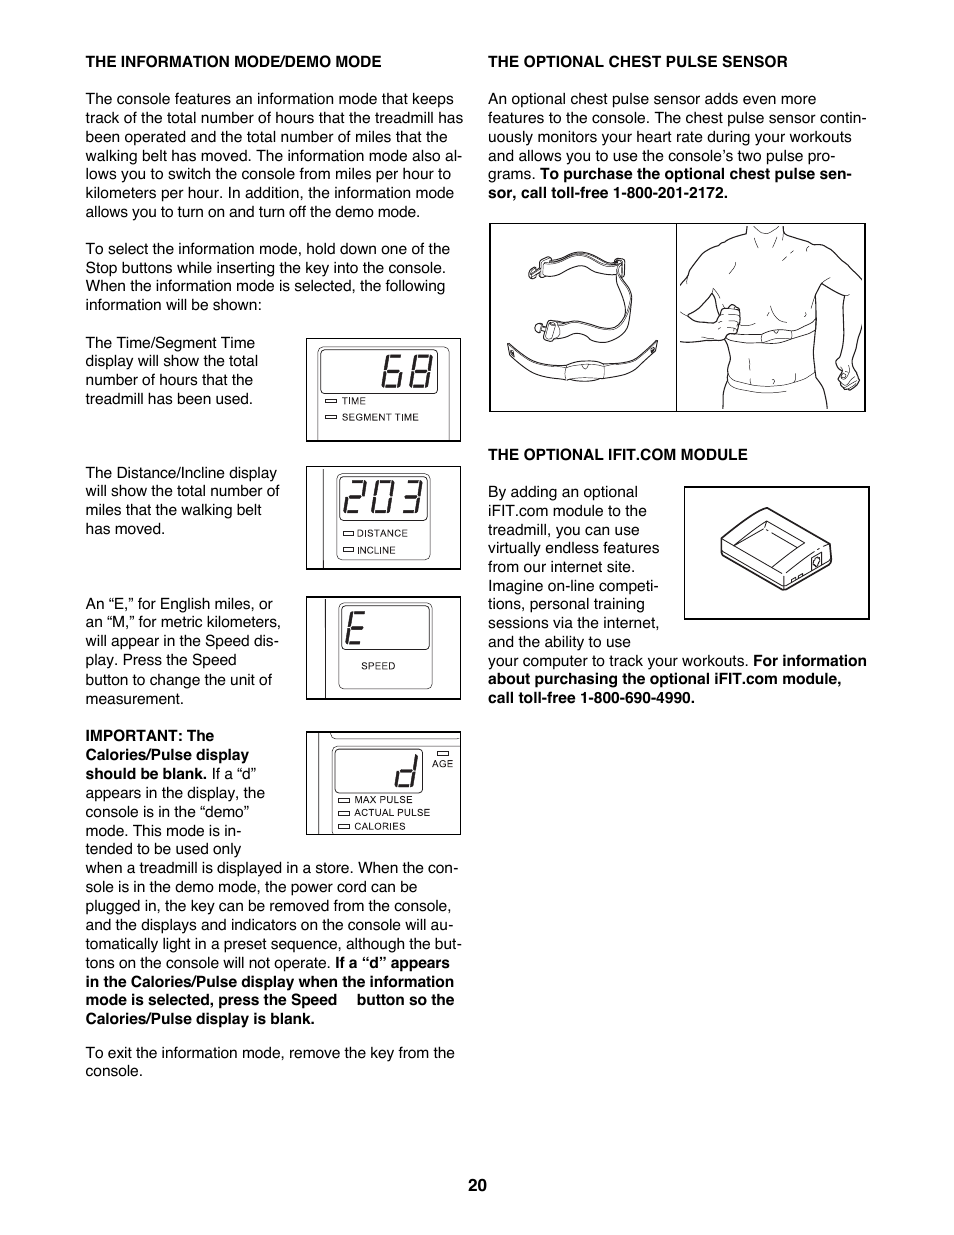 Healthrider S250i HRTL06900 User Manual   Page 20 / 30